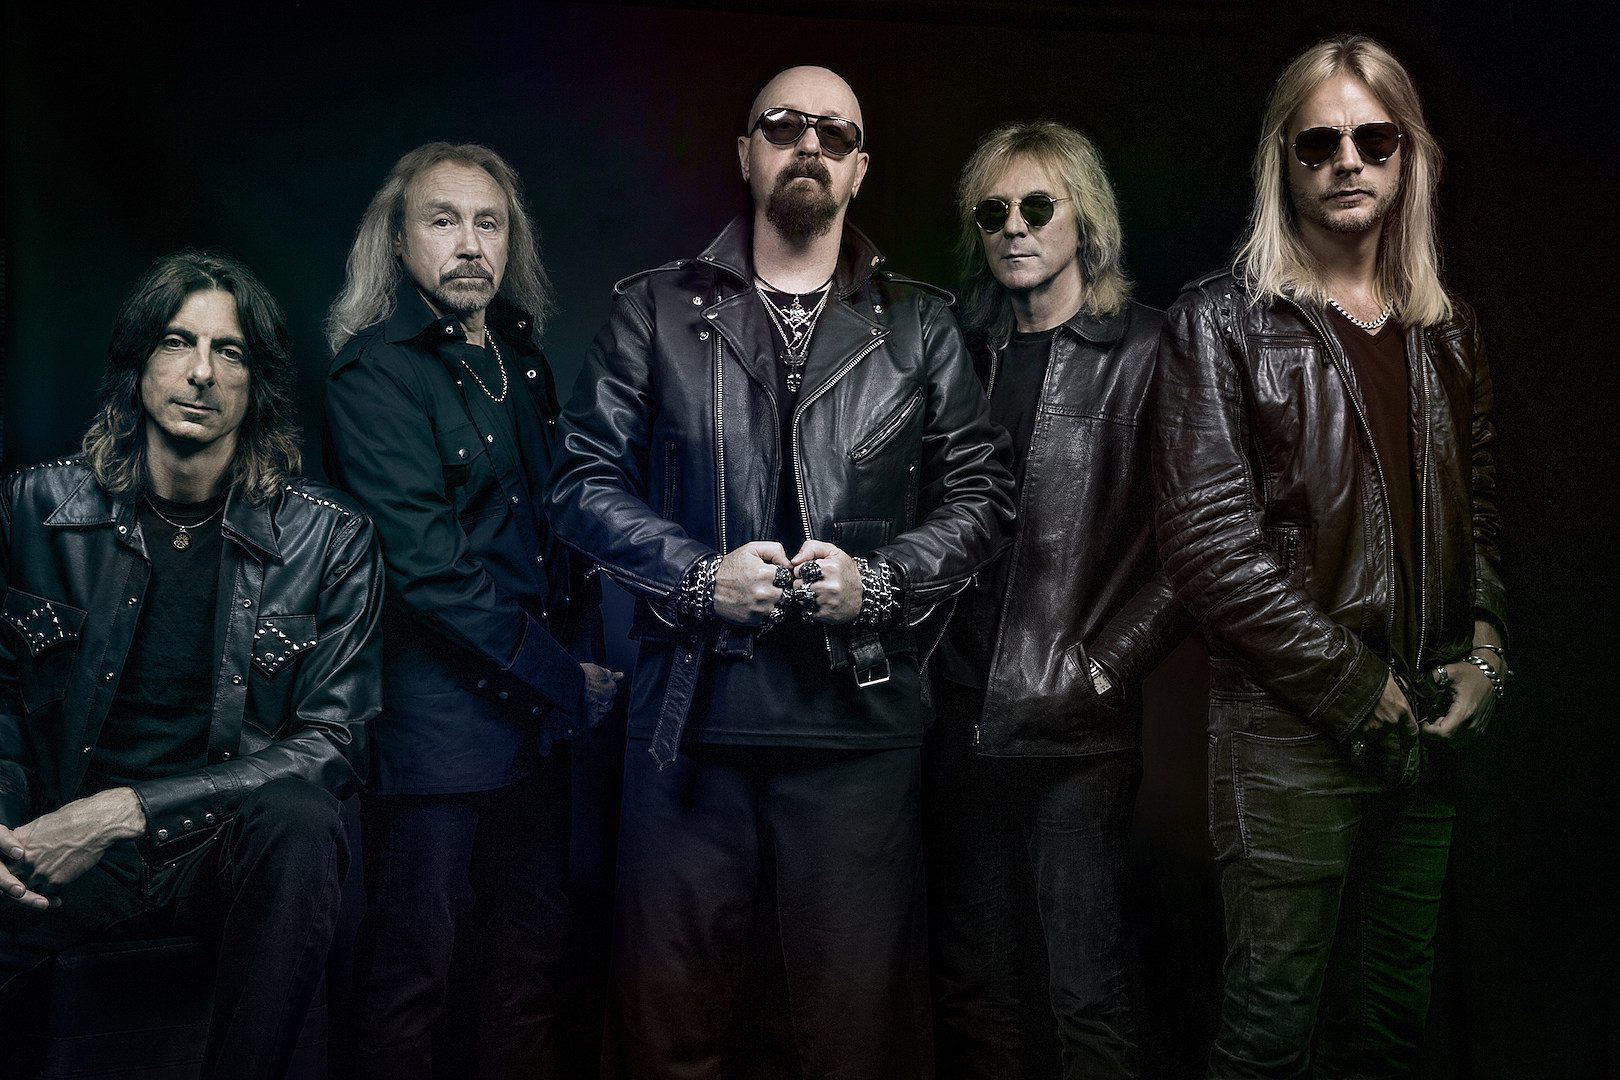 Glenn Tipton Joins Judas Priest Onstage in New Jersey